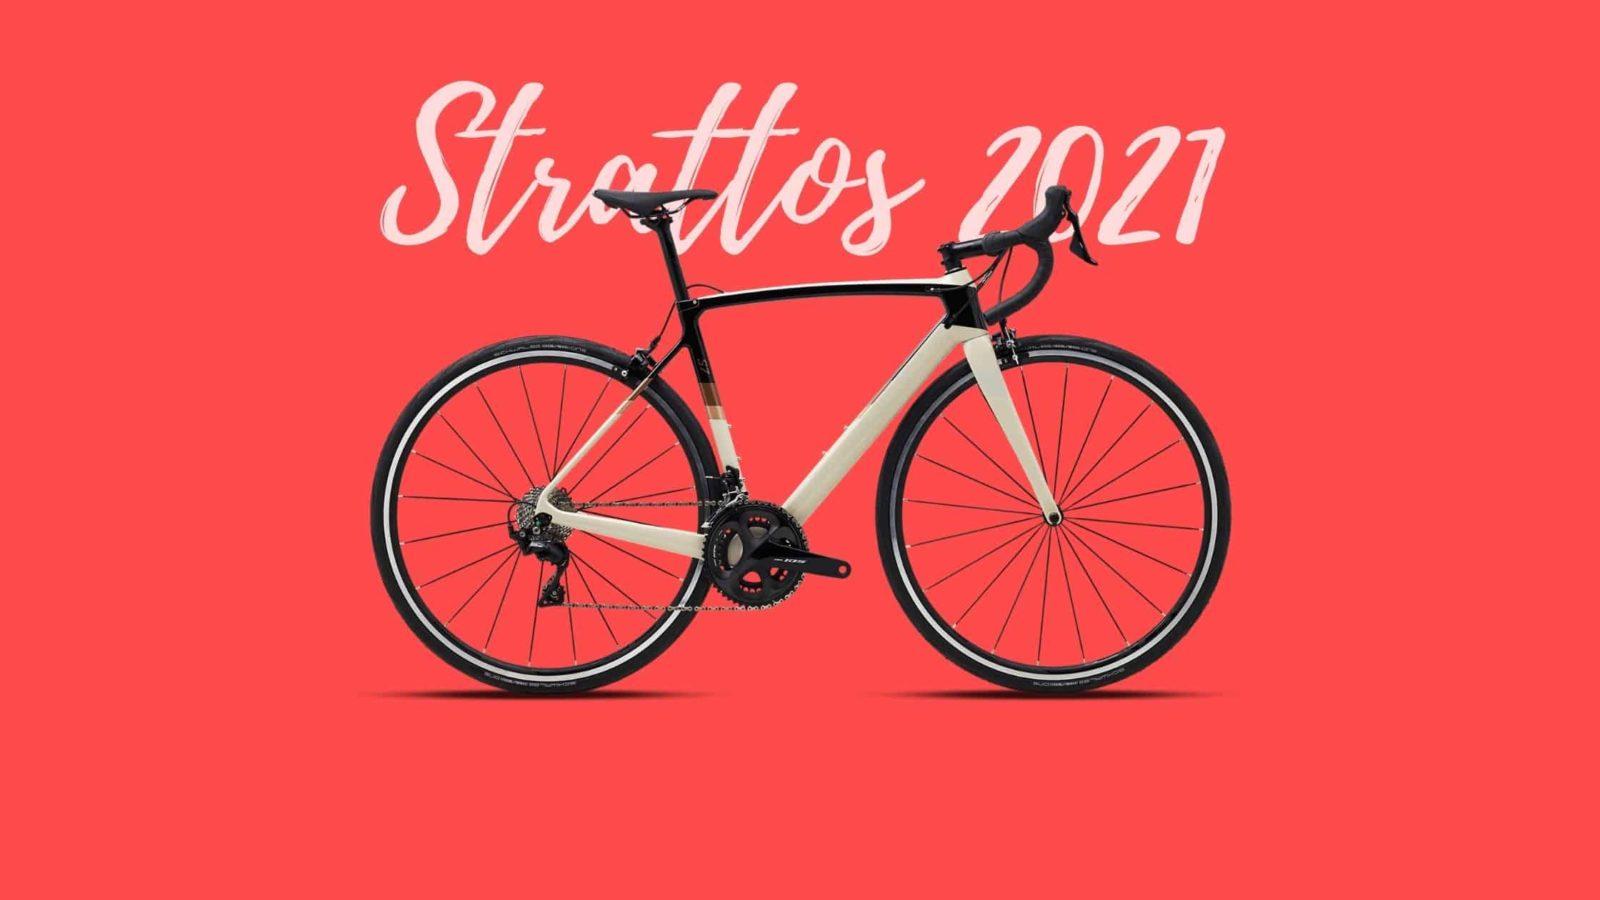 Sepeda balap Polygon Strattos edisi 2021